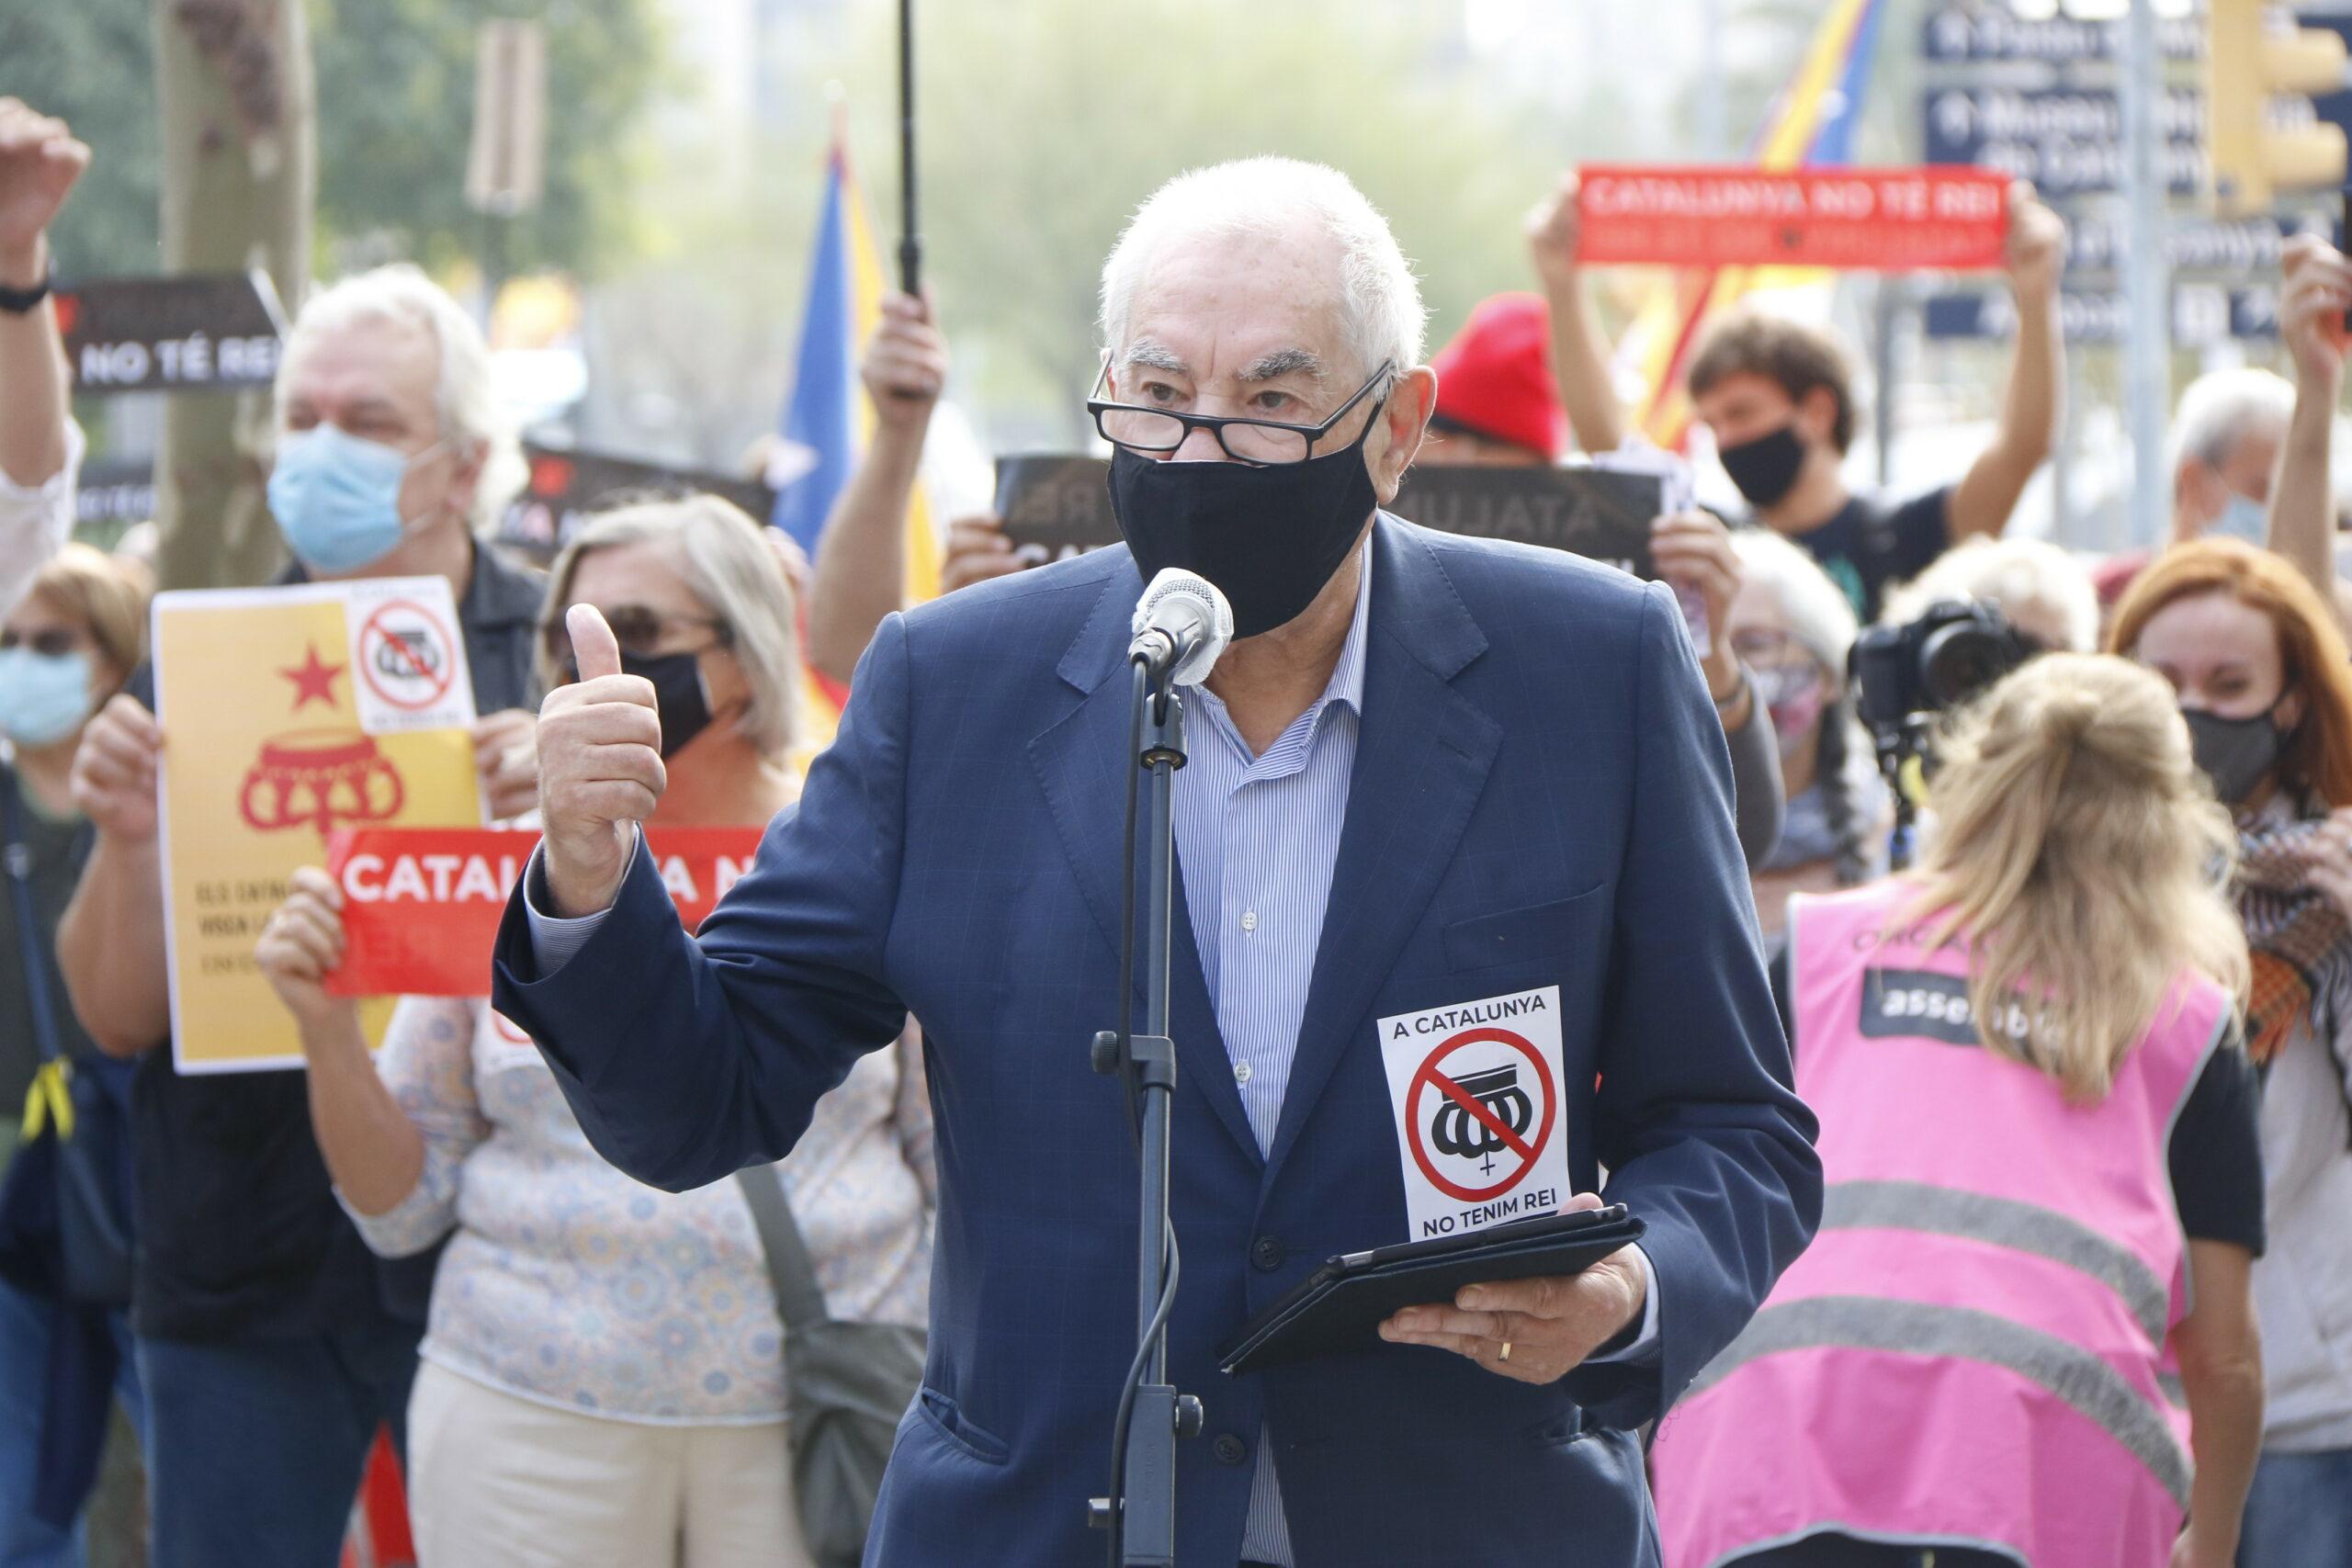 Ernest Maragall (ERC) en una atenció als mitjans en una protesta contra la visita de Felip VI | ACN